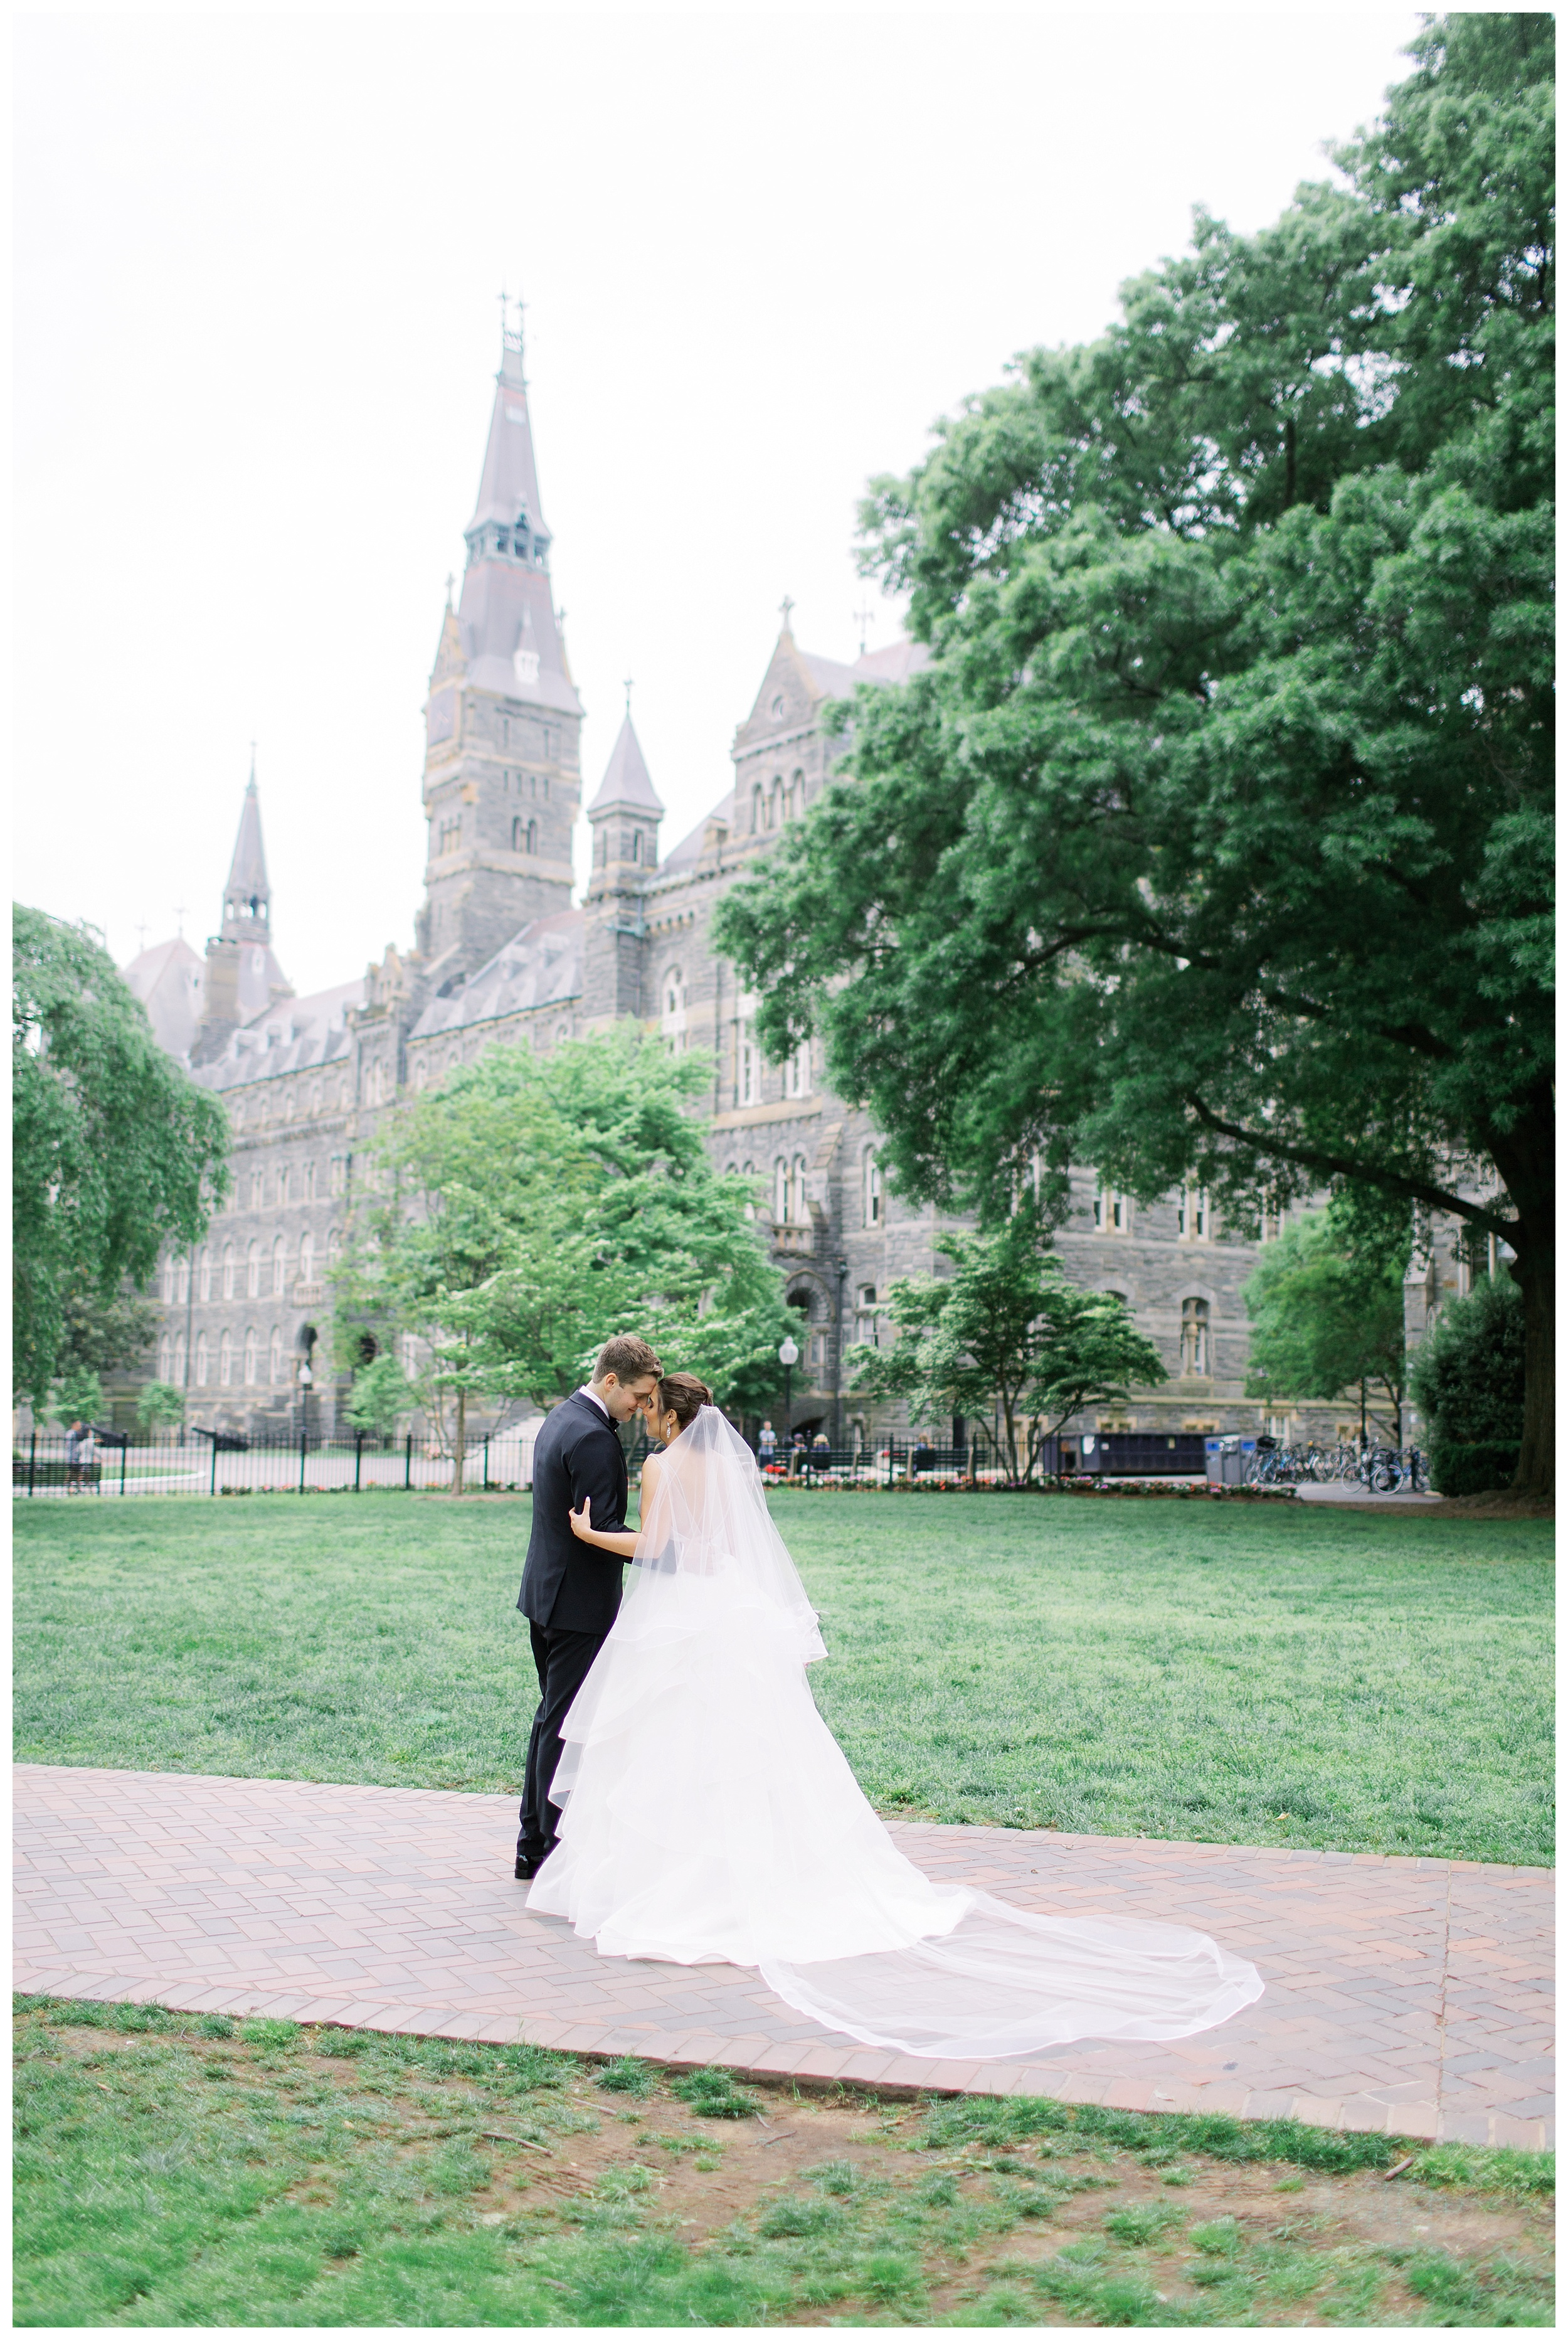 DAR Constitution Hall Wedding Wedding | Daughters of the American Revolution Wedding | District of Columbia Film Wedding Photographer Kir Tuben_0060.jpg